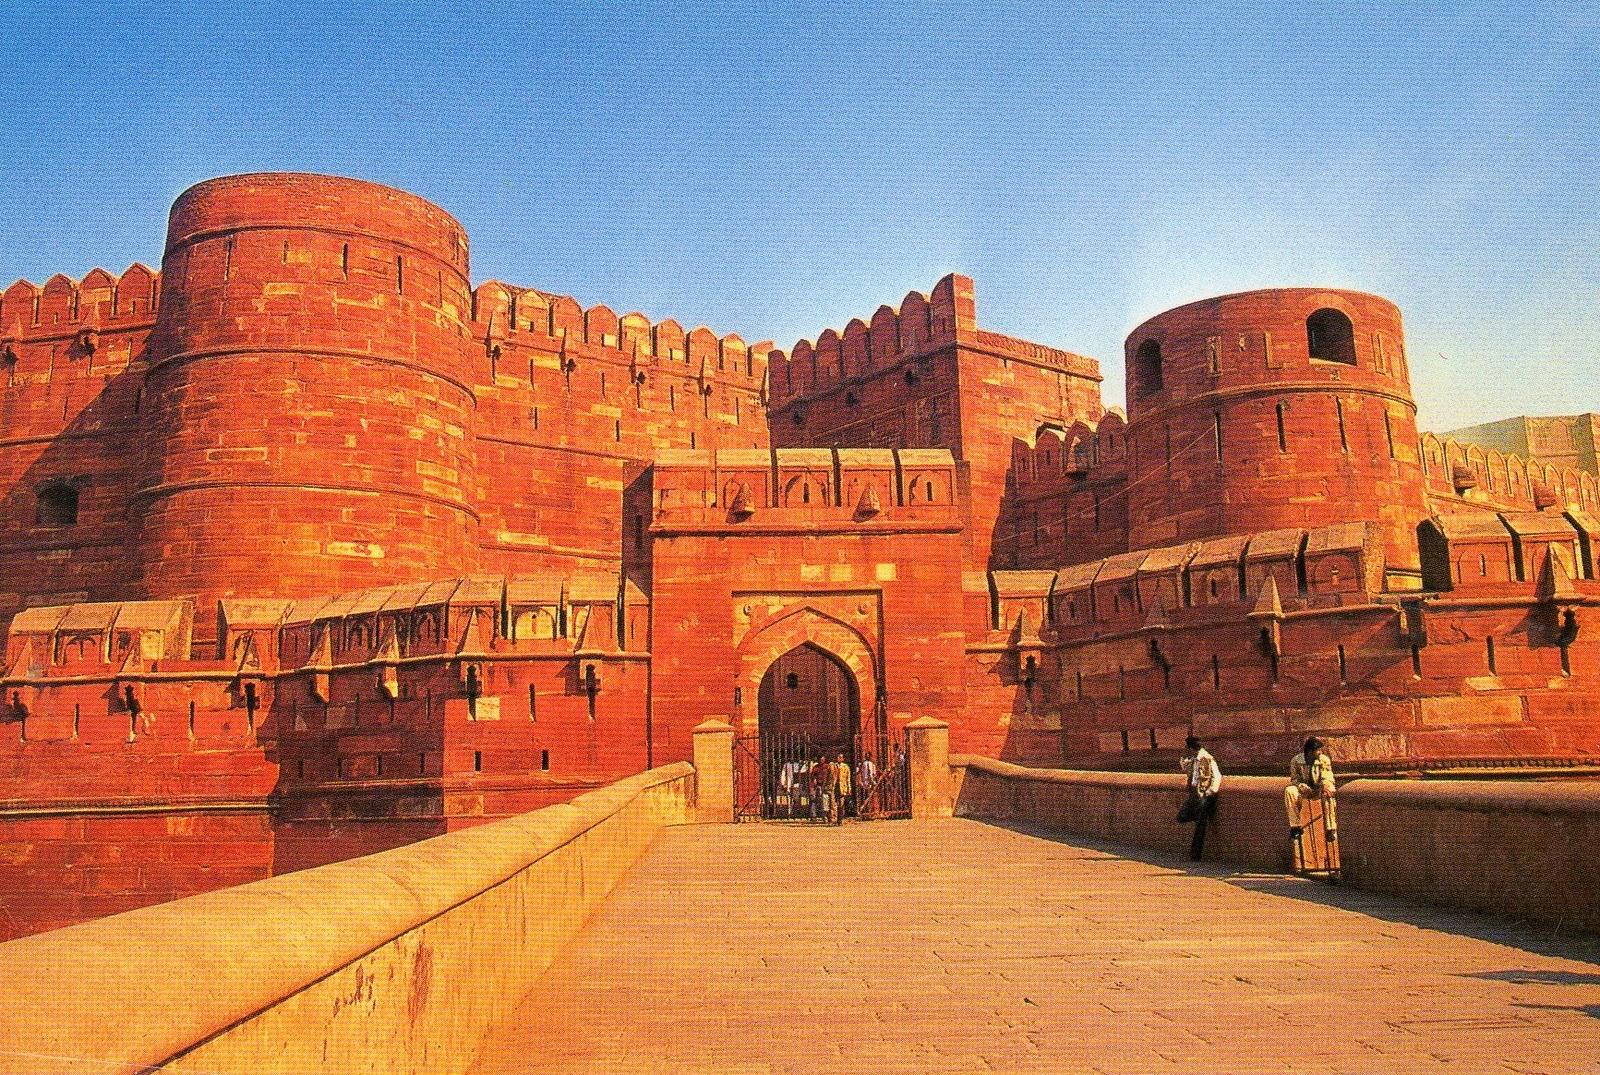 √ Sejarah Berdirinya Kerajaan Mughal di India dan Perkembangannya!